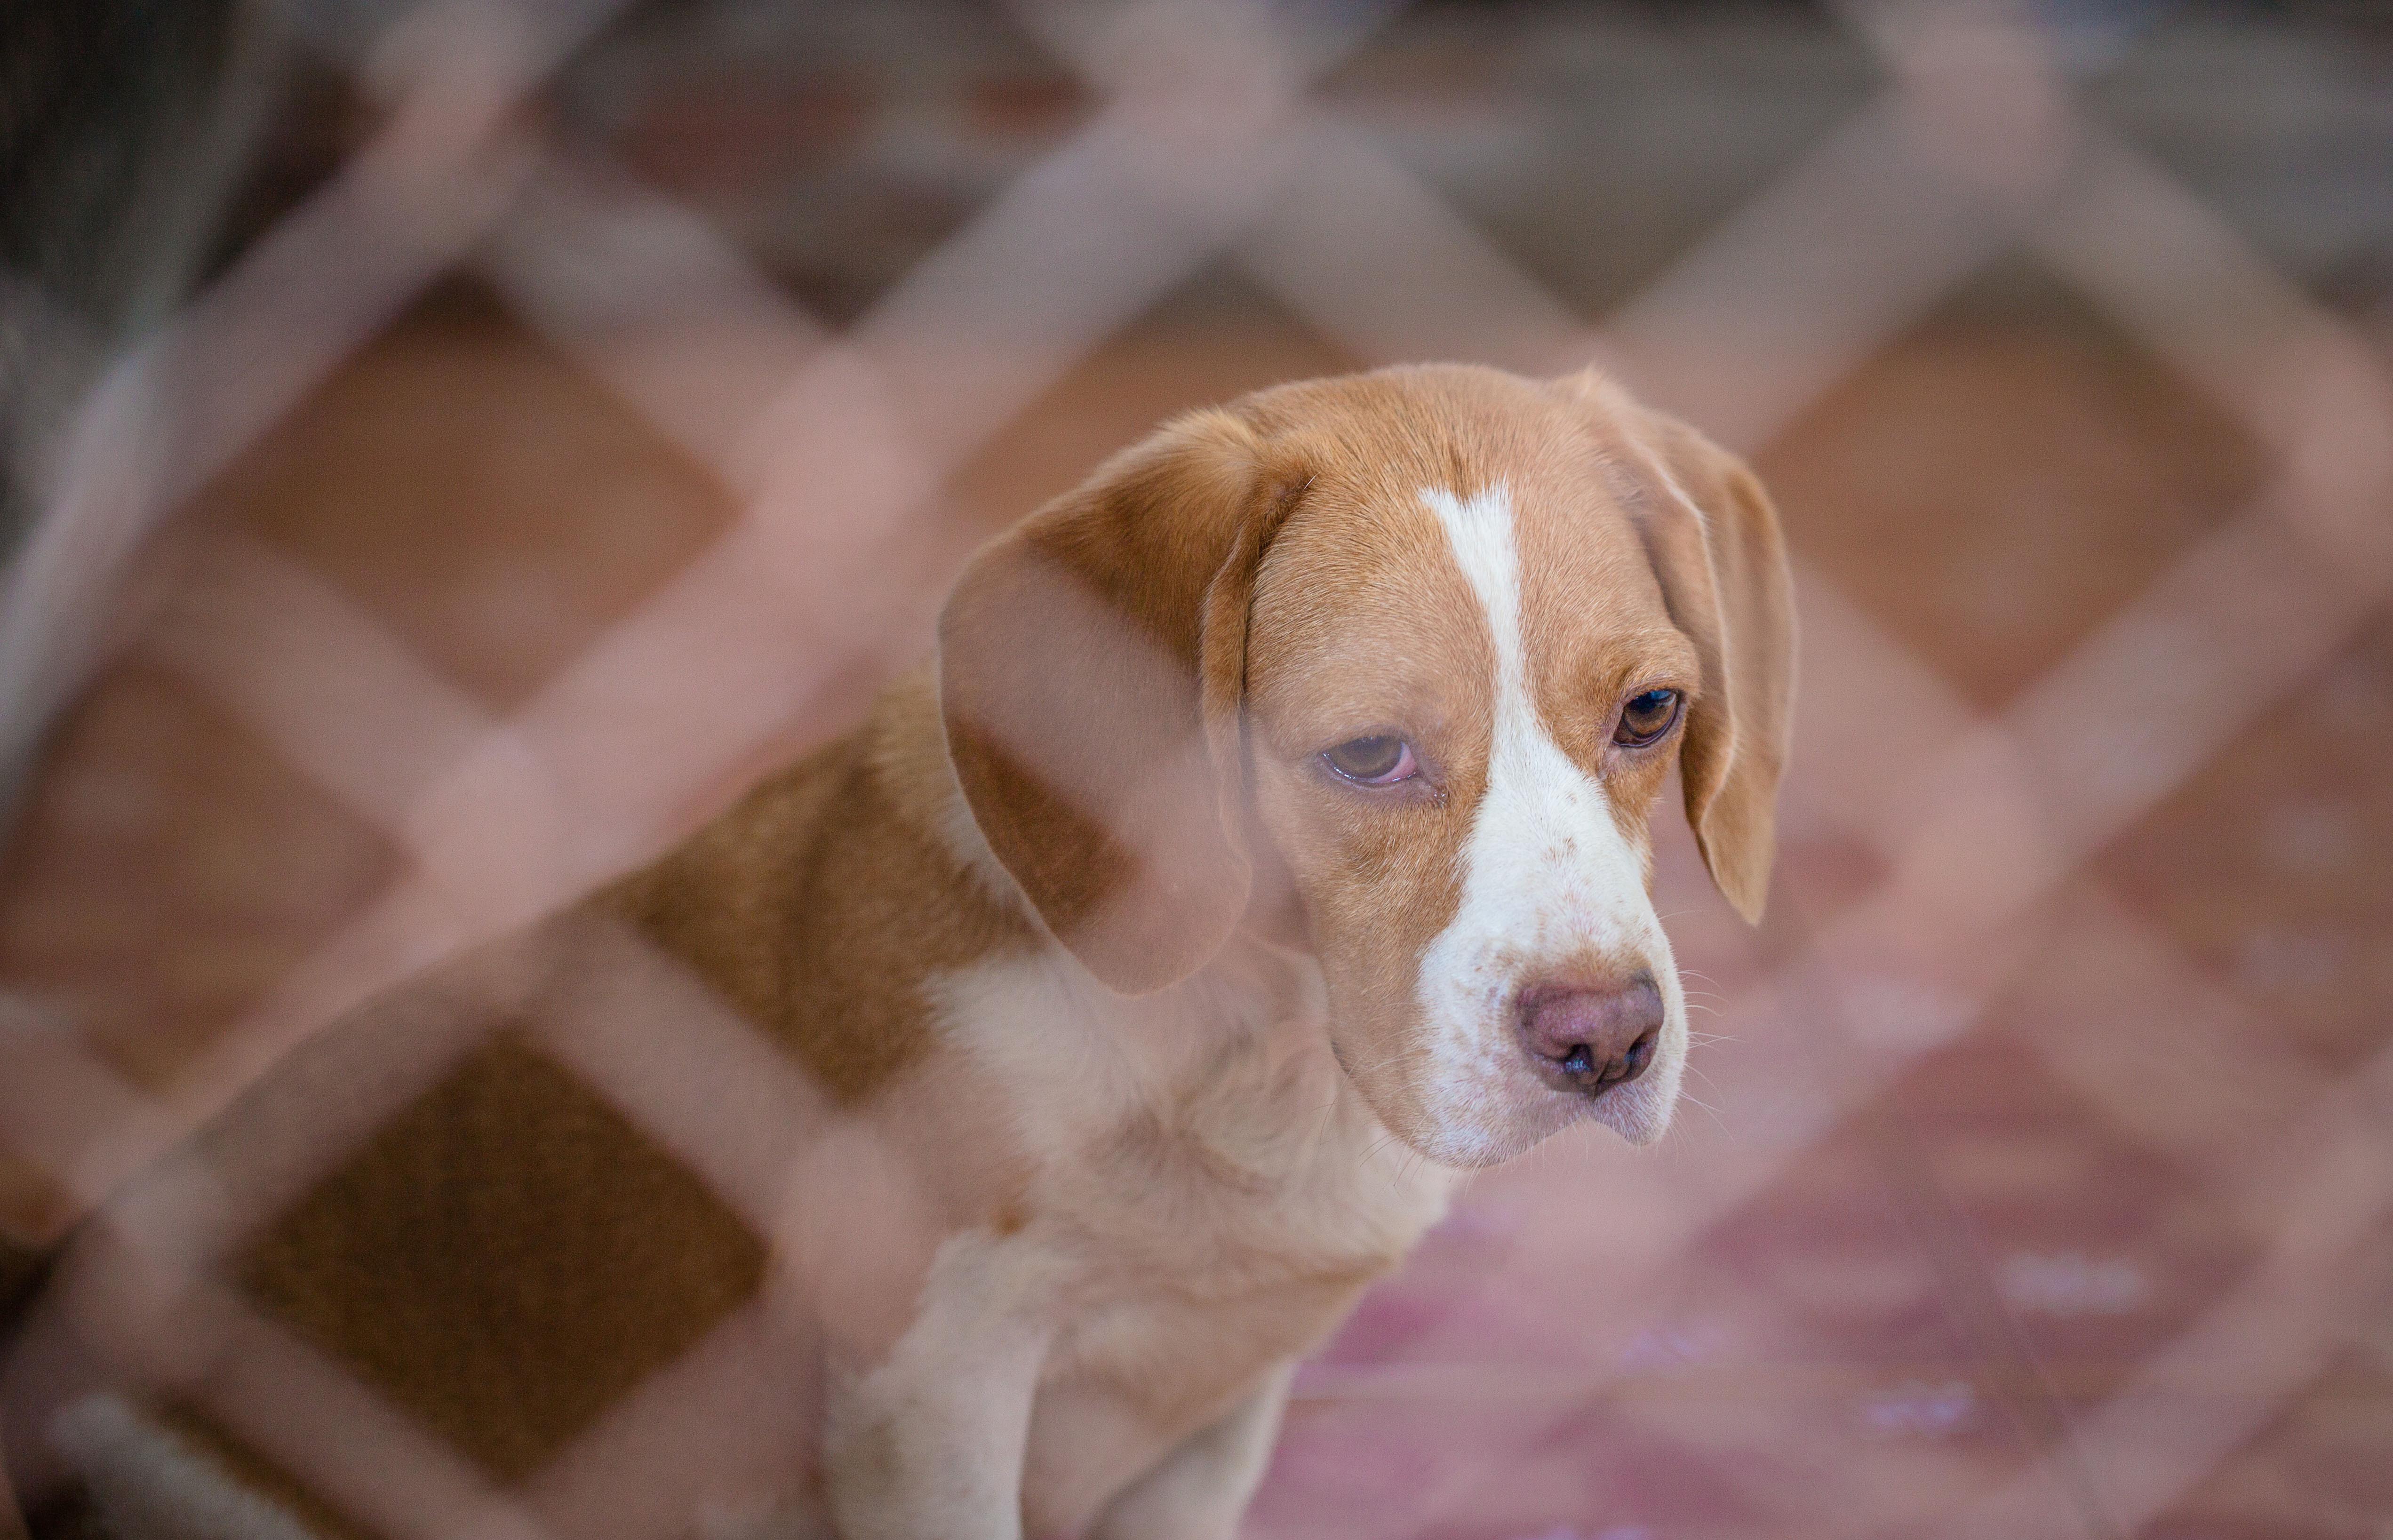 beagle_pink_nose_sad.jpg